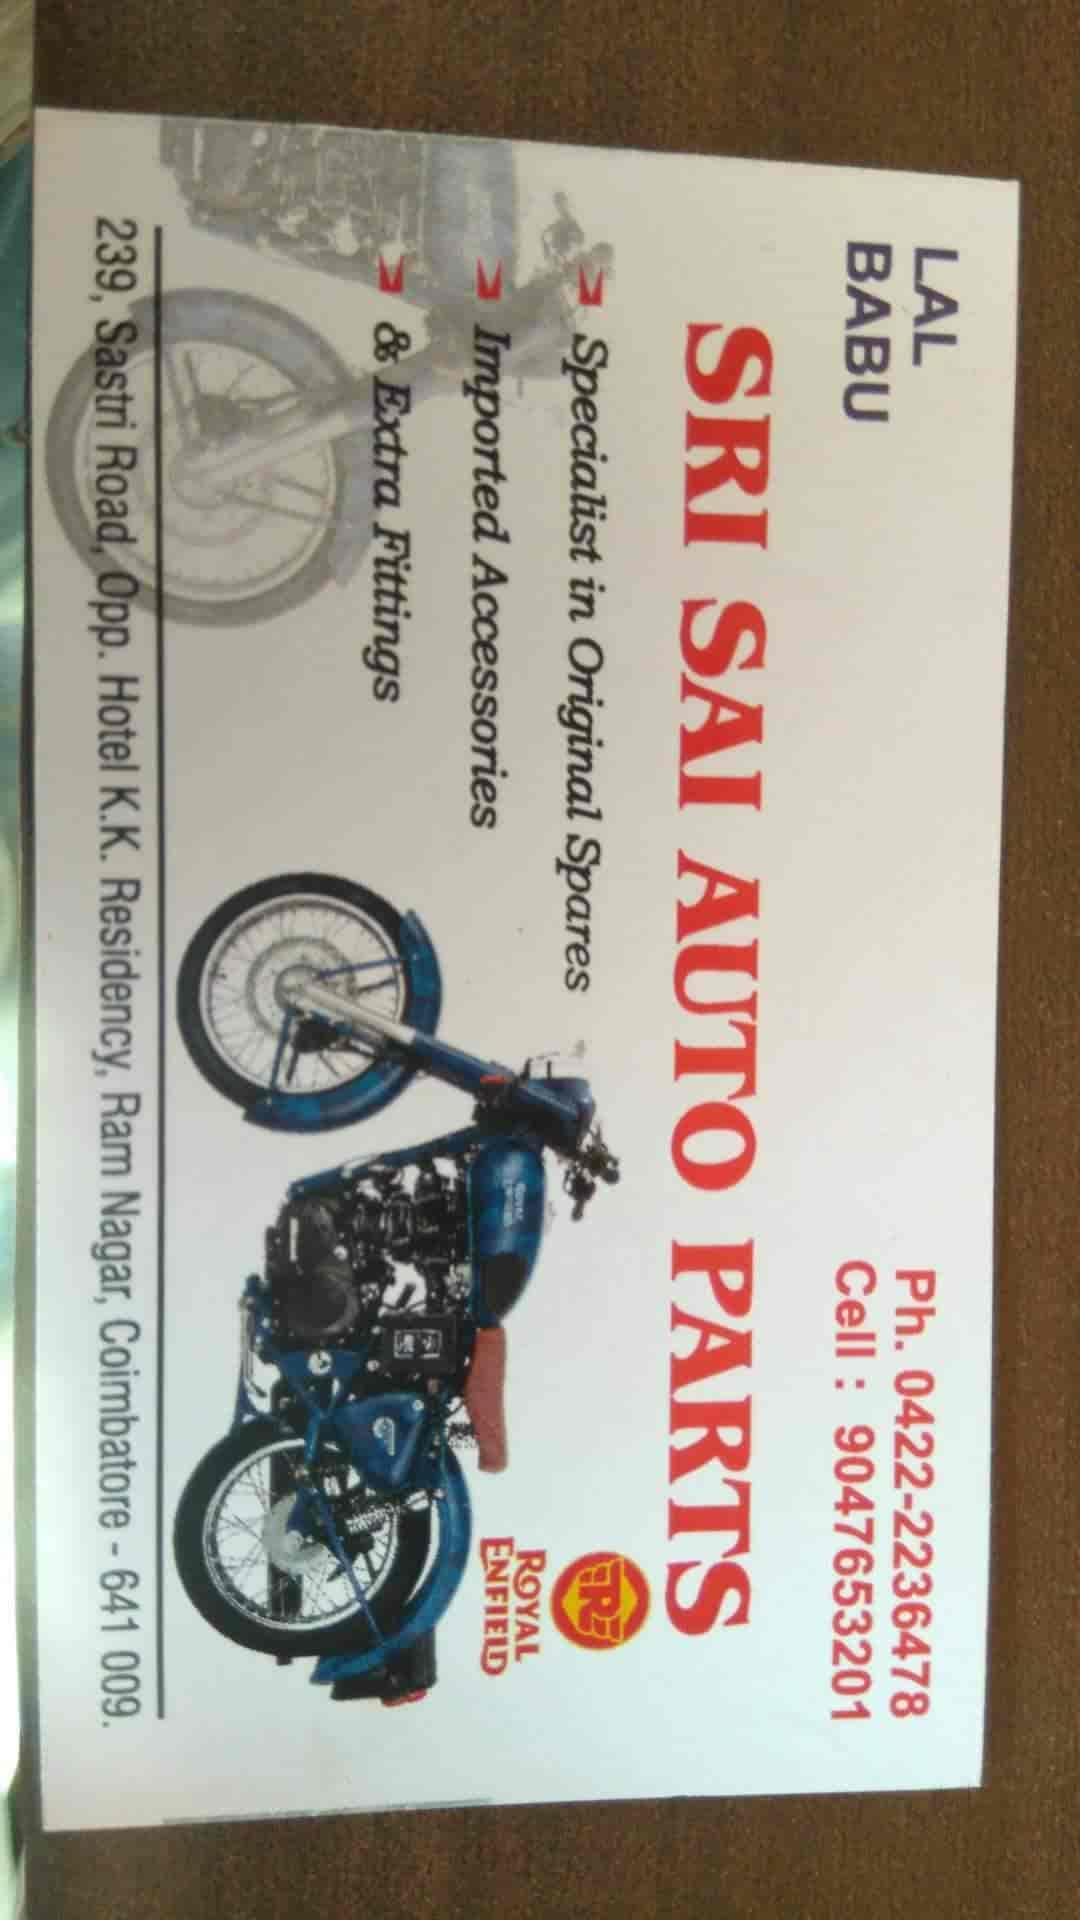 Sai Auto Parts, Gandhipuram - Motorcycle Part Dealers in Coimbatore